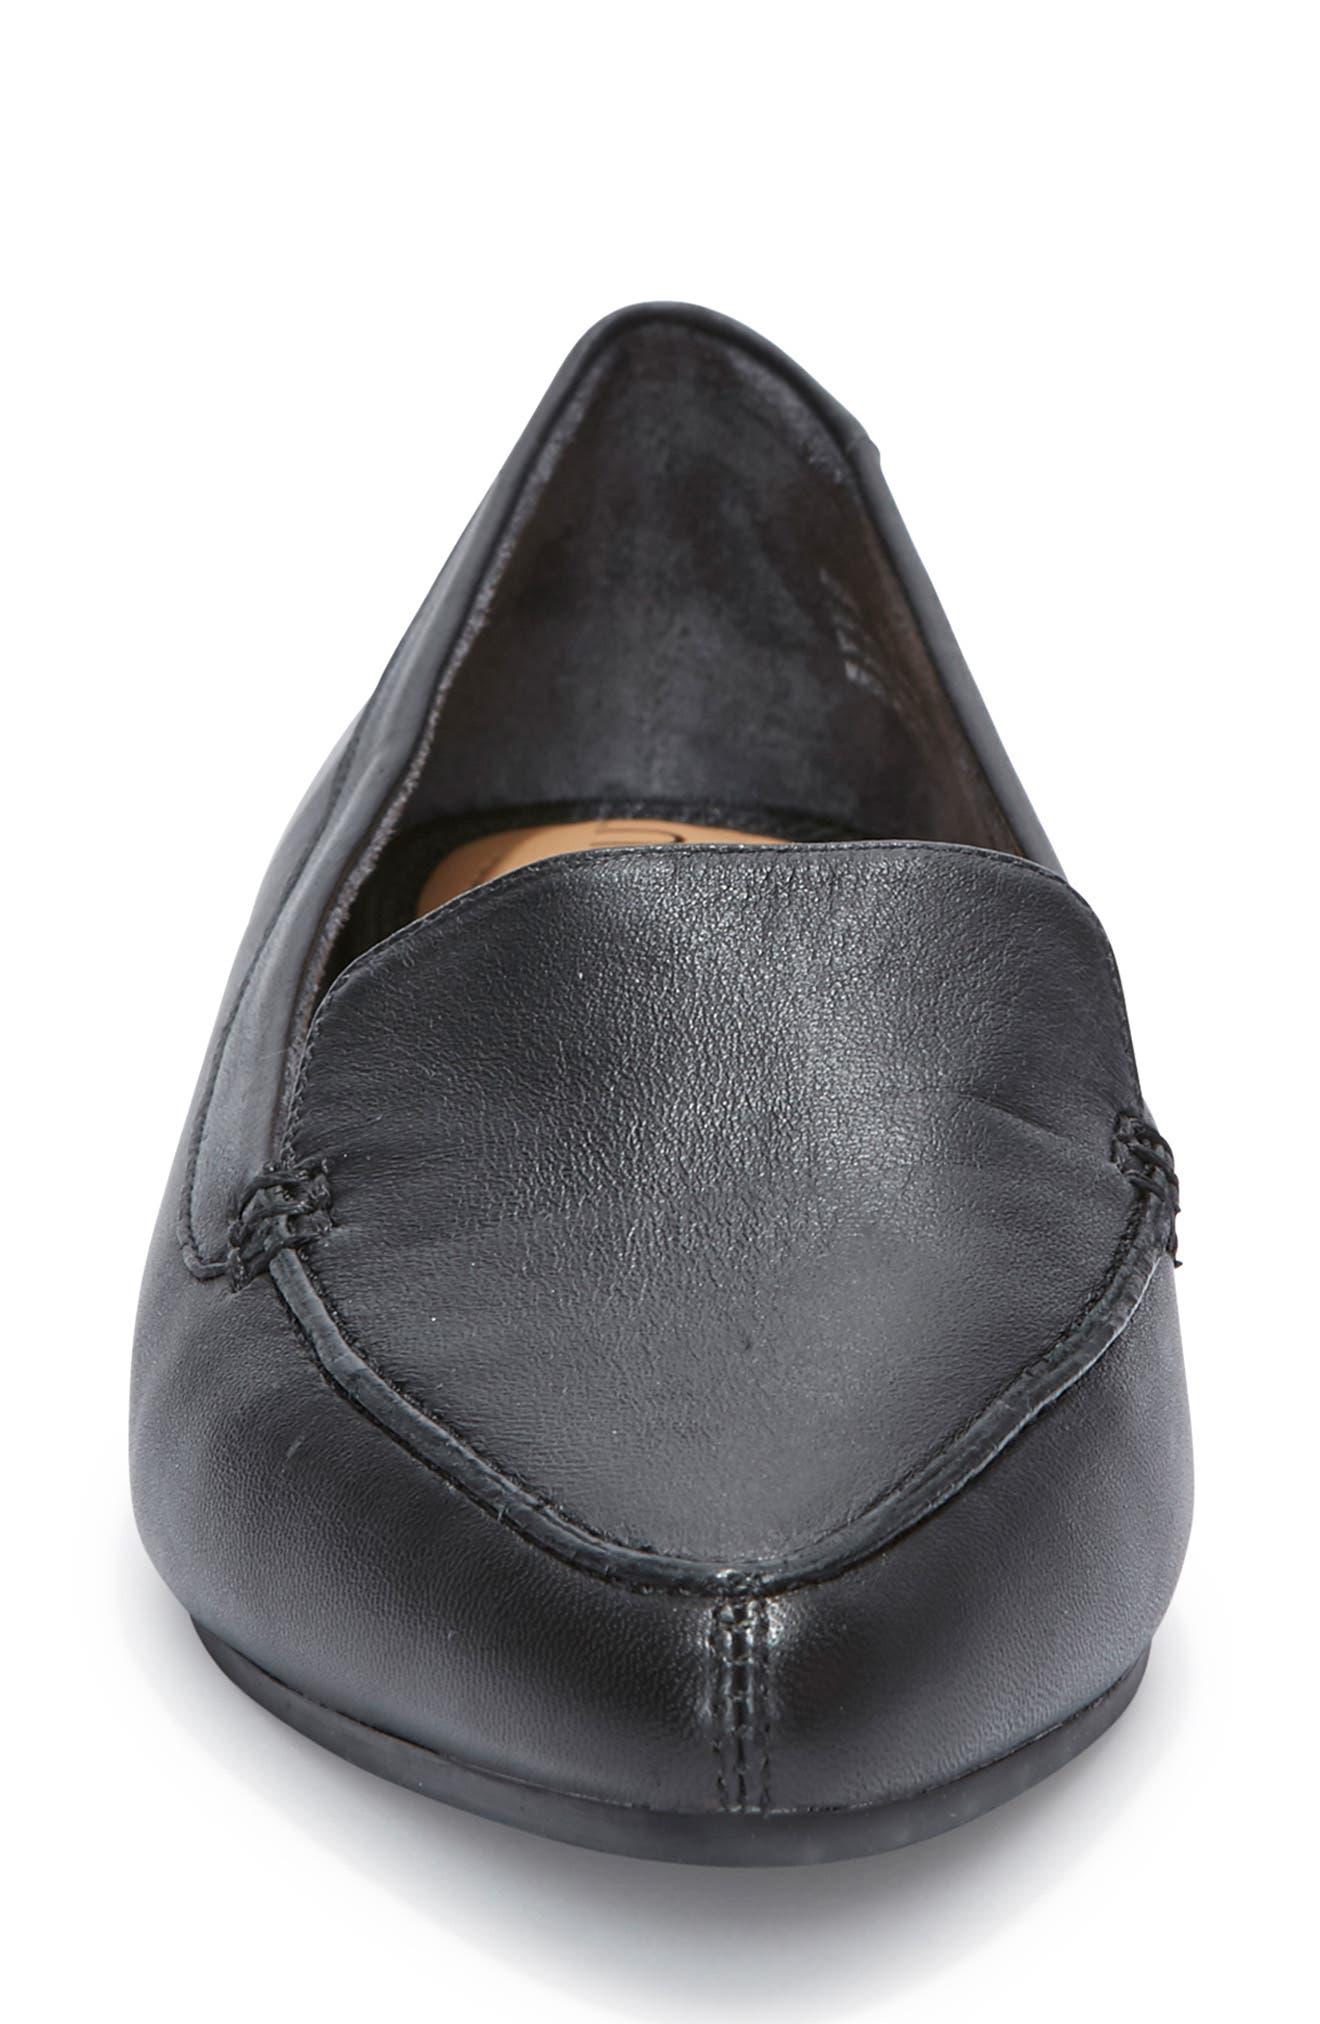 Audra Loafer Flat,                             Alternate thumbnail 4, color,                             BLACK/ BLACK LEATHER